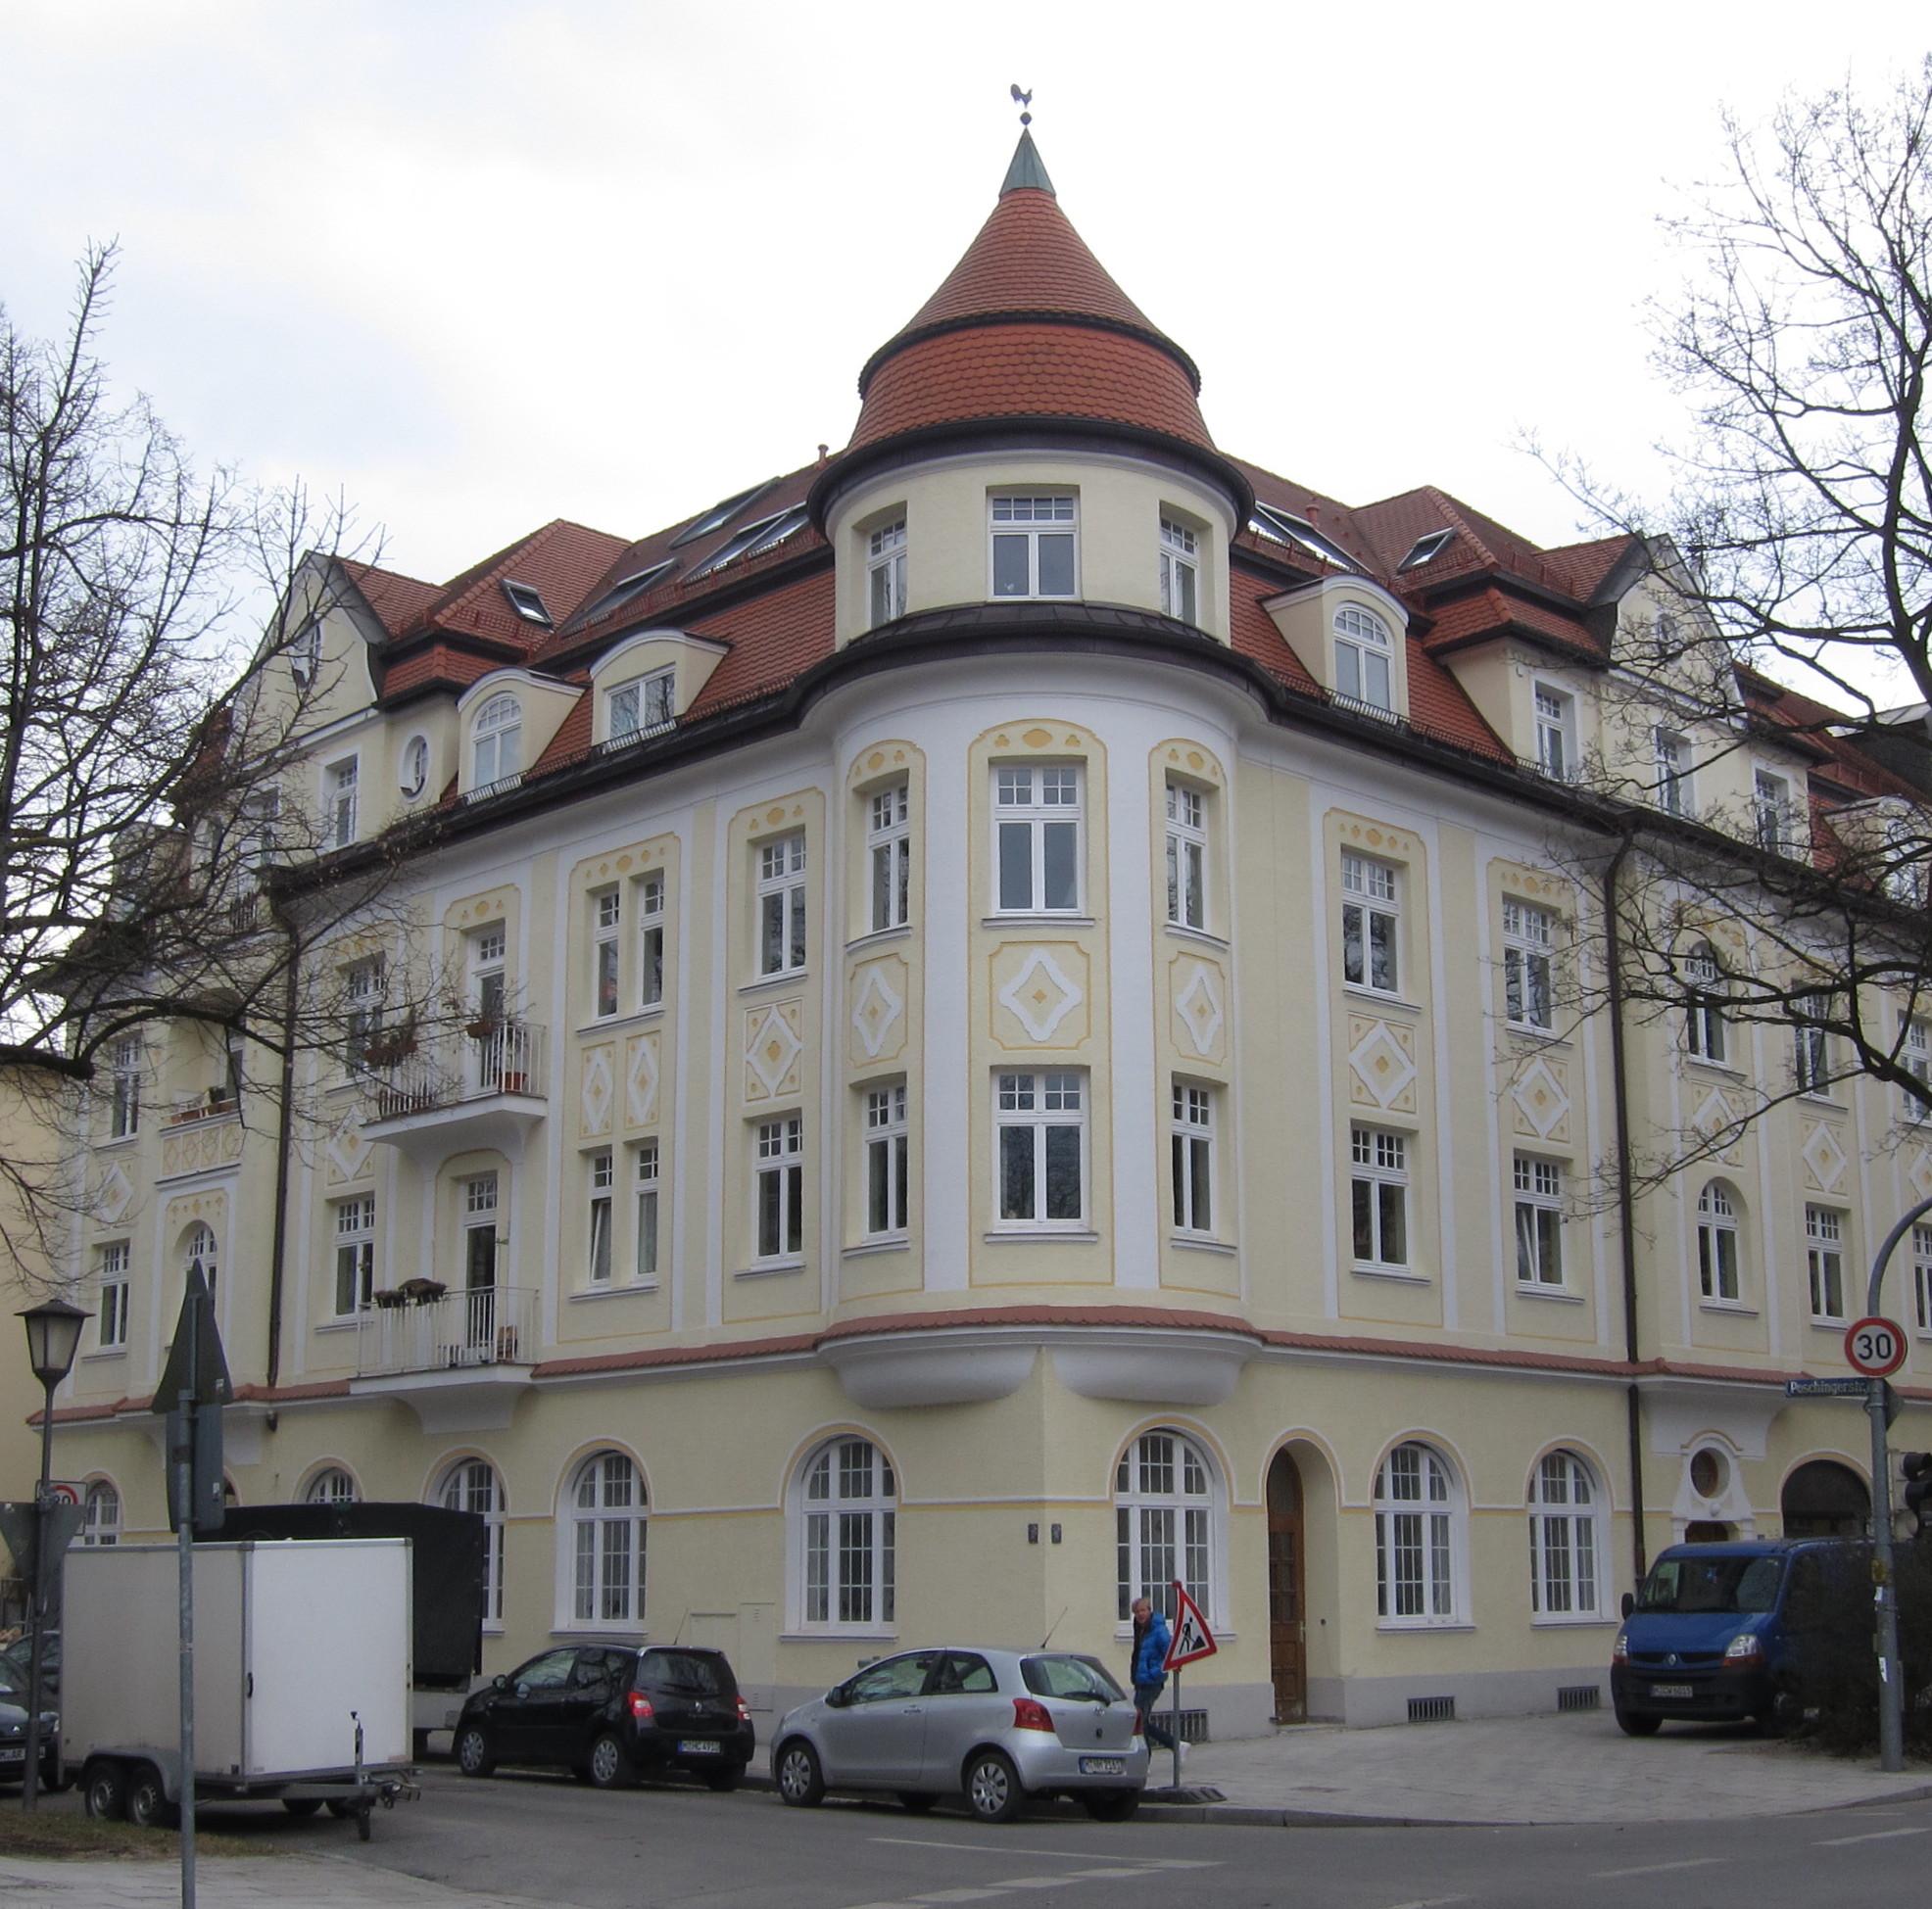 Mauerkircherstr München file mauerkircherstr 40 muenchen 01 jpg wikimedia commons